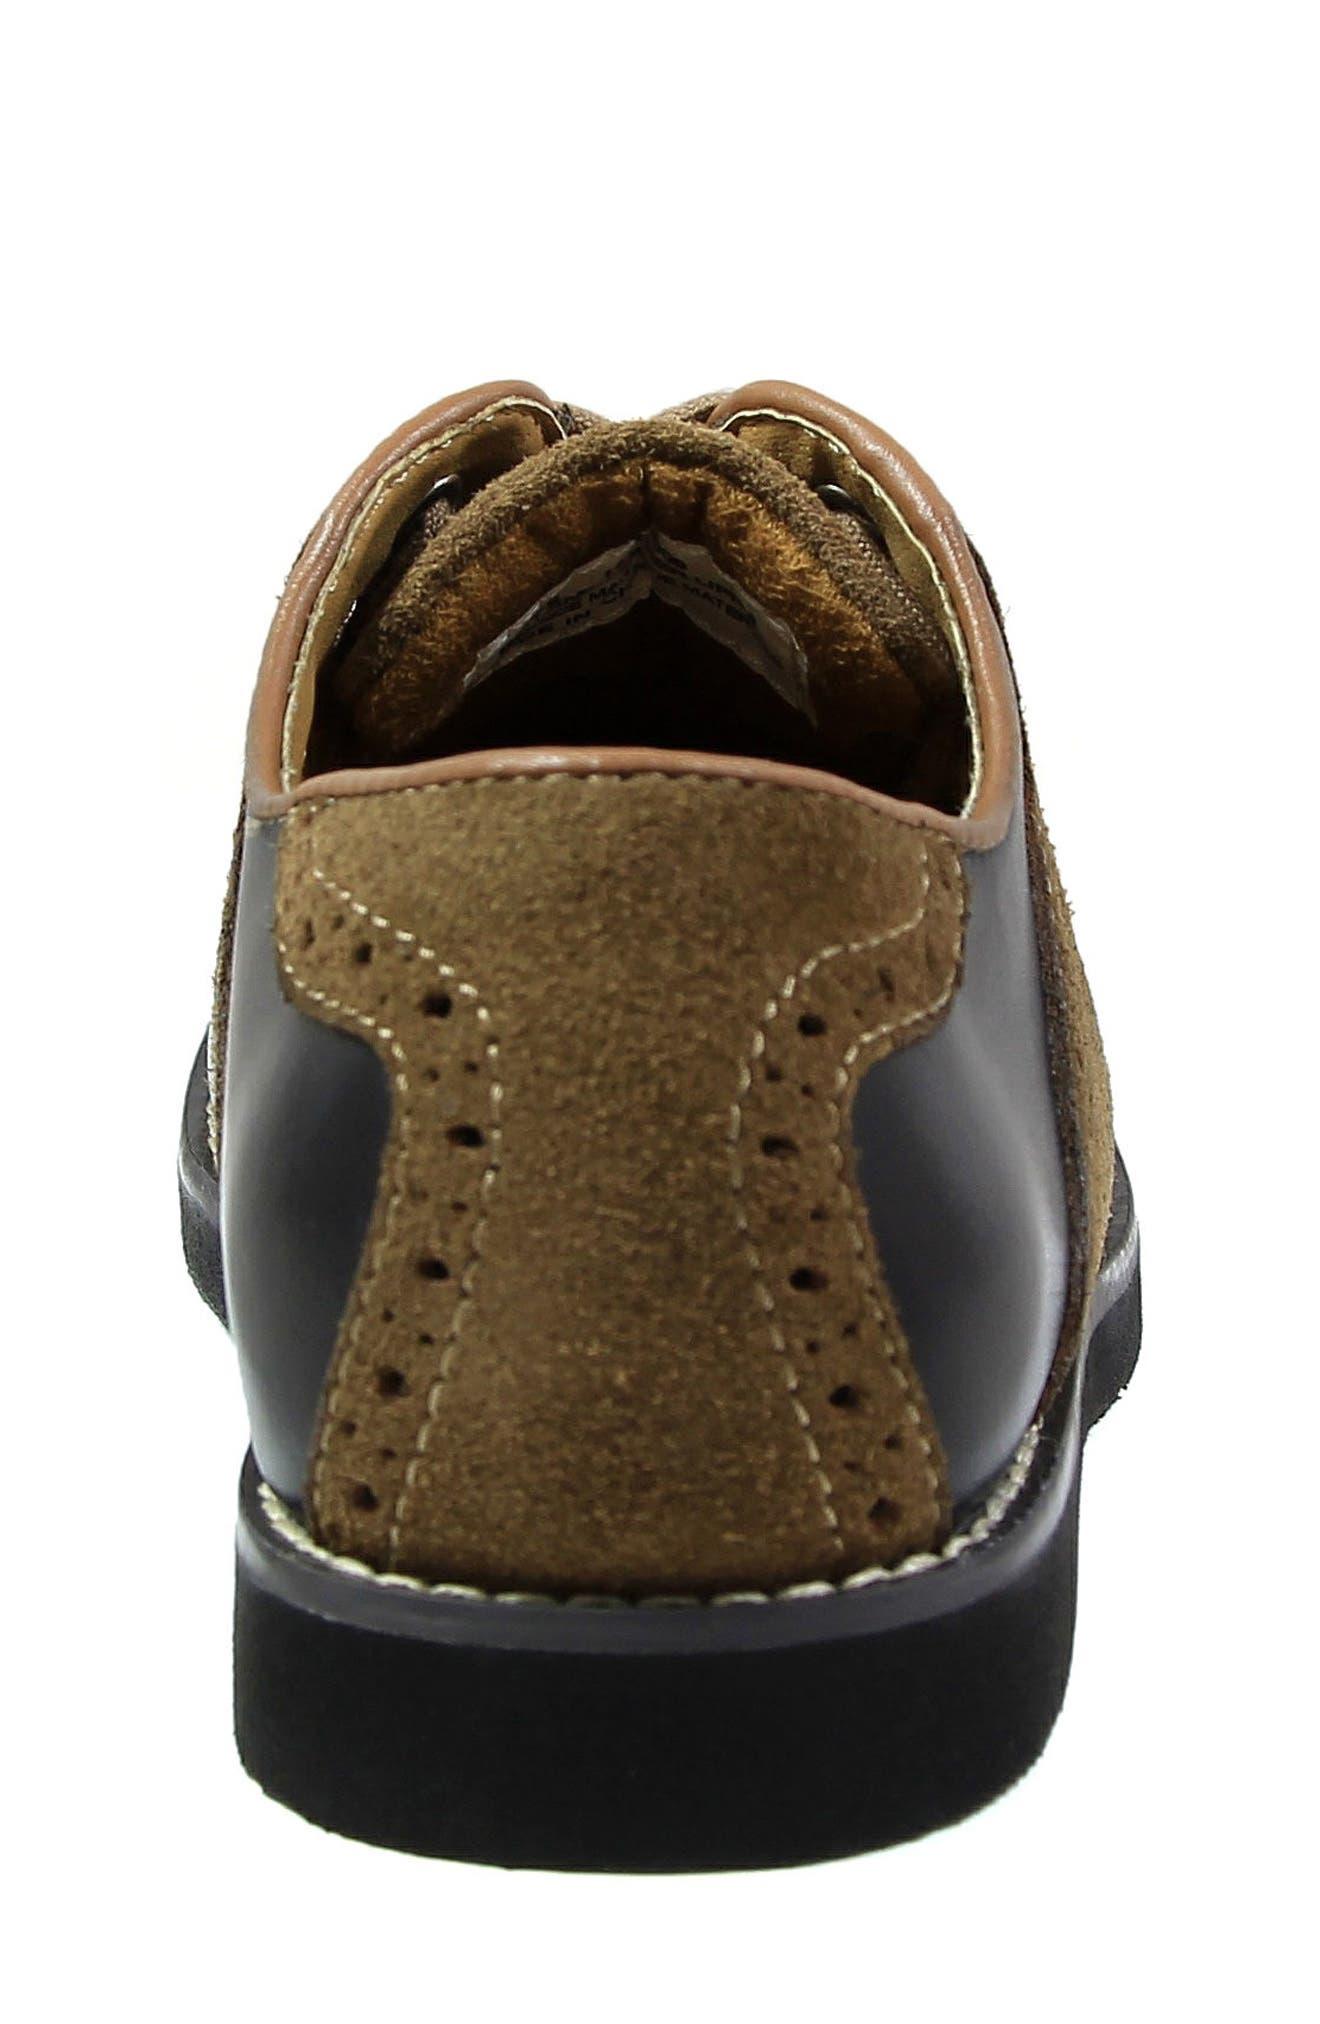 FLORSHEIM, 'Kennett Jr. II' Saddle Shoe, Alternate thumbnail 6, color, SMOOTH BLACK W/ MOCHA SUEDE